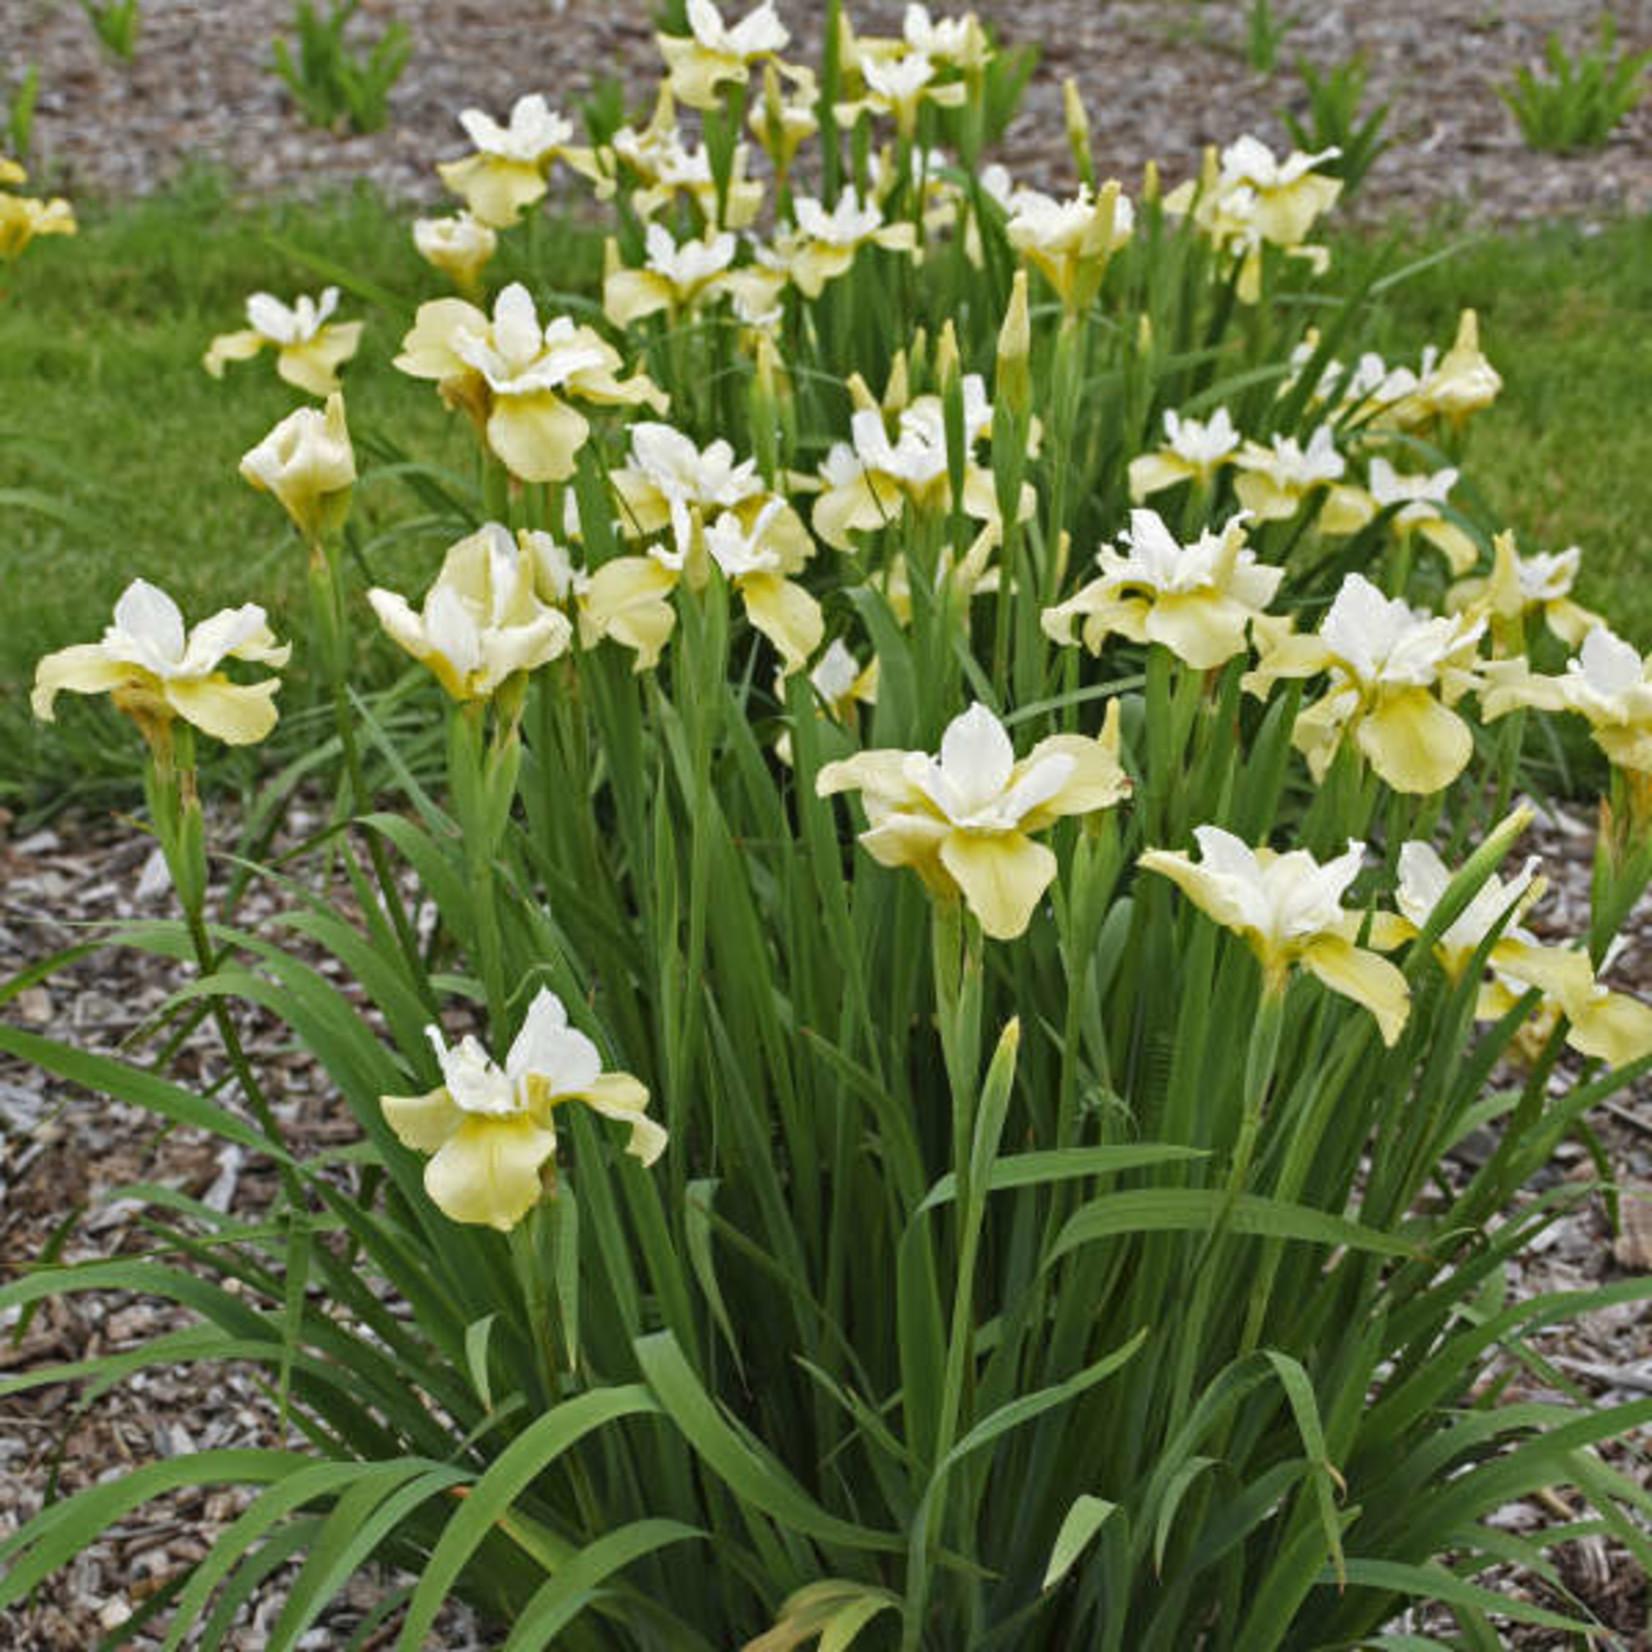 Iris Siberian 'Butter and Sugar' - 1 gal